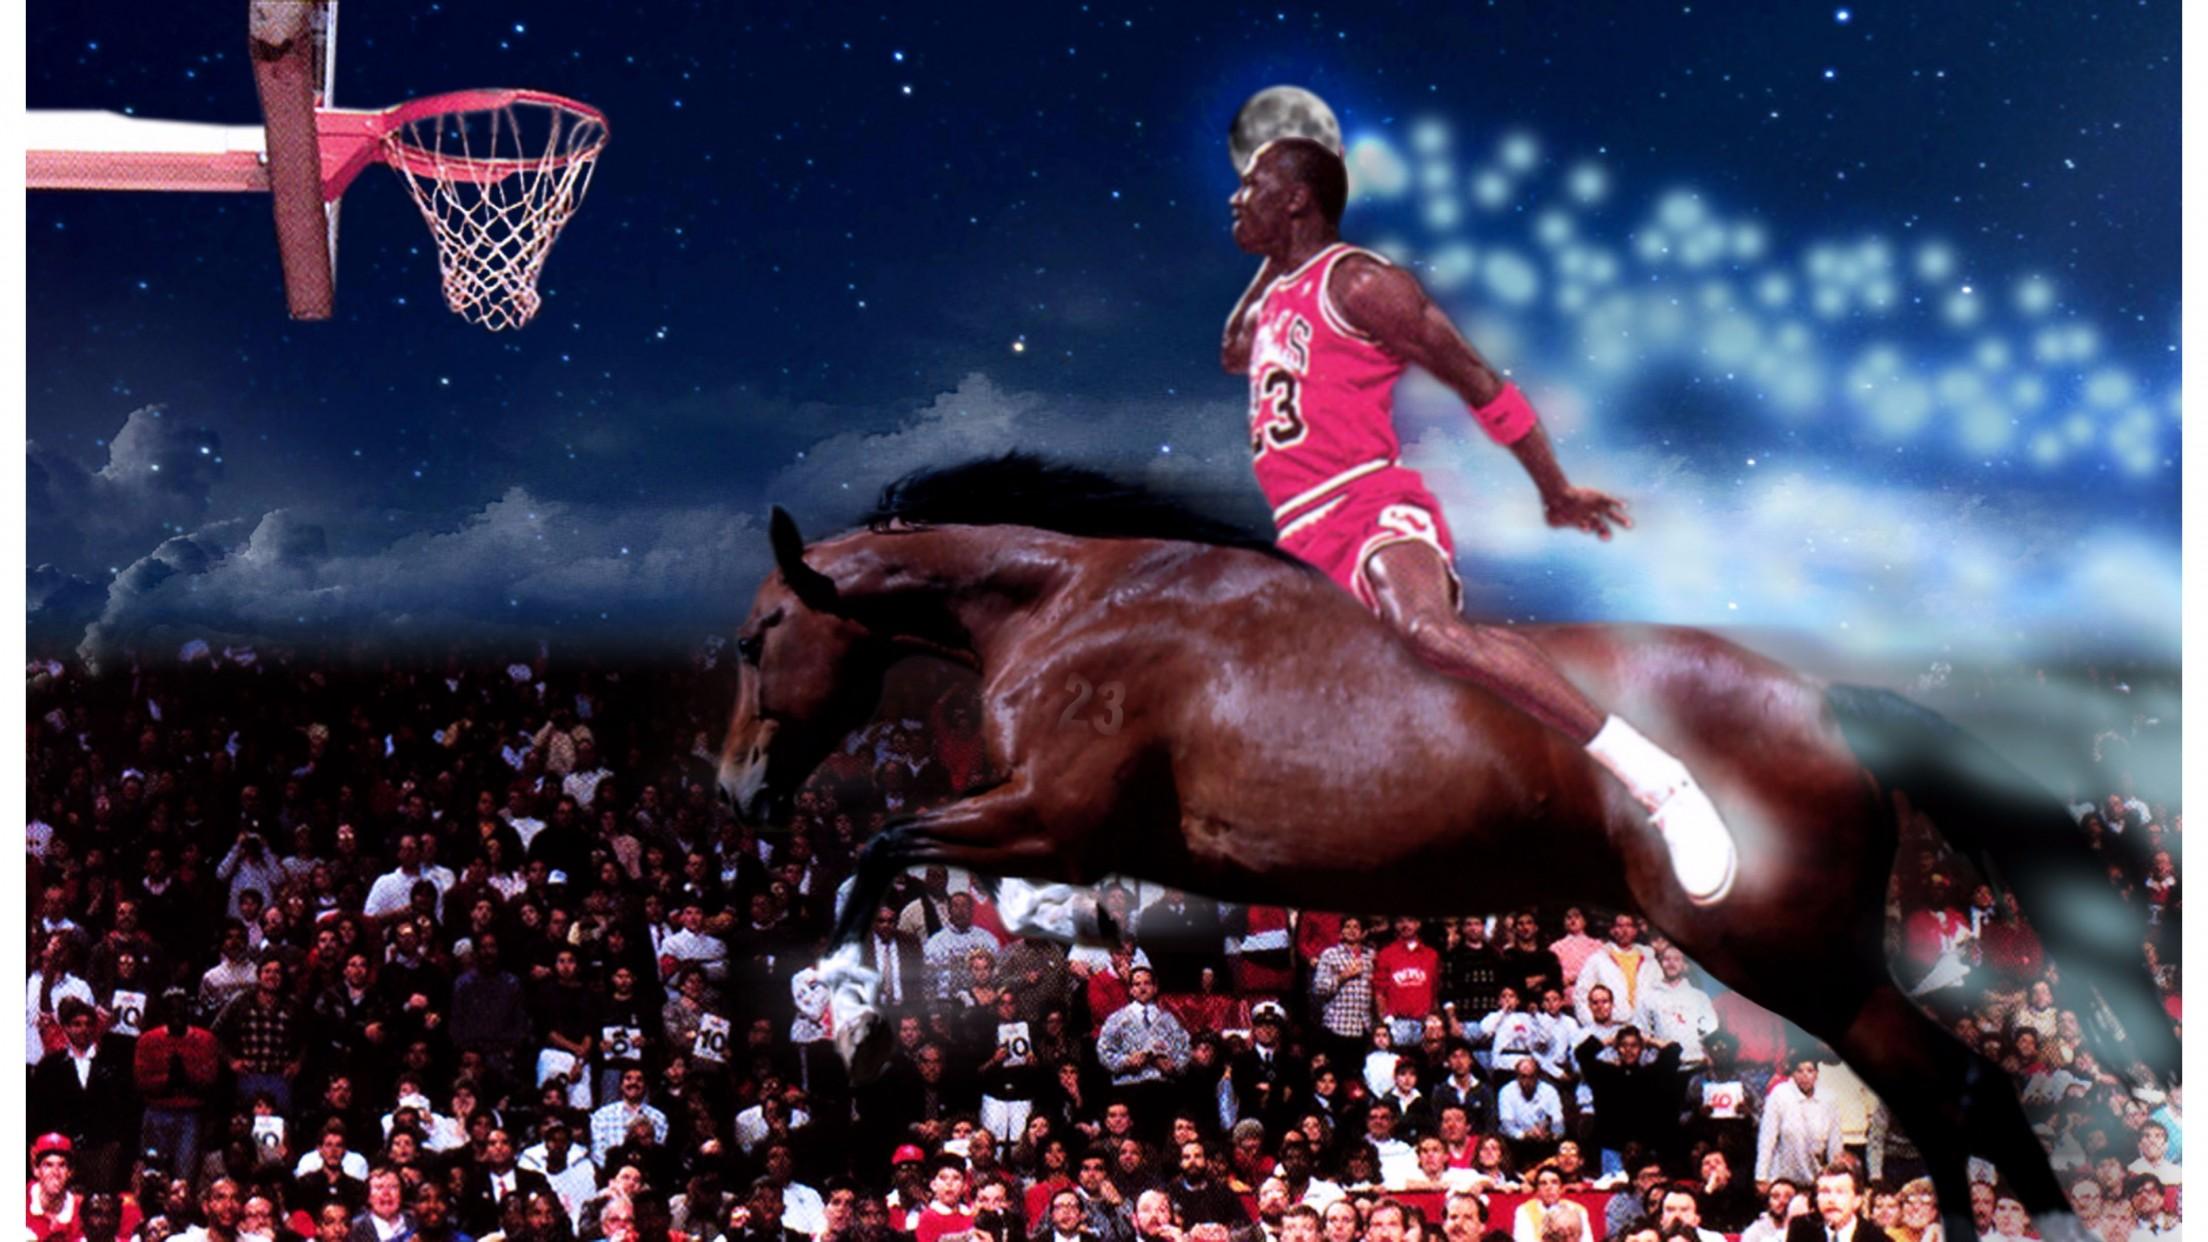 Abstract Michael Jordan 4K Wallpaper 4K Wallpaper 2208x1242